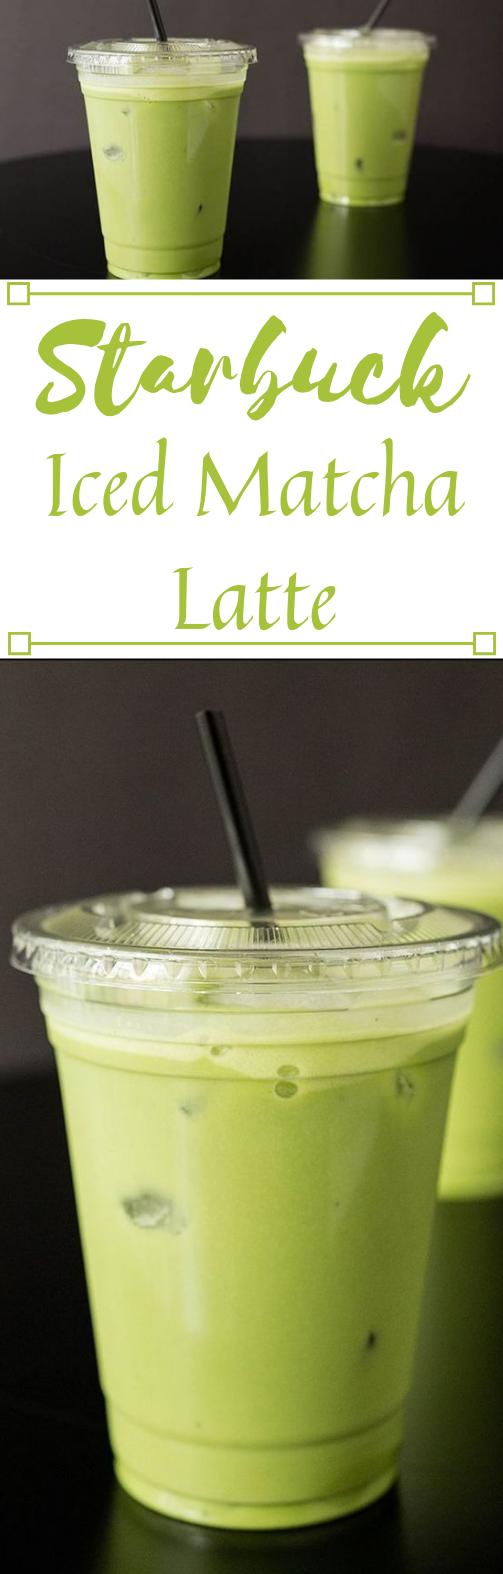 Copycat Starbucks Iced Matcha Latte Recipe #healthydrink #cocktail #starbucks #icecream #smoothie